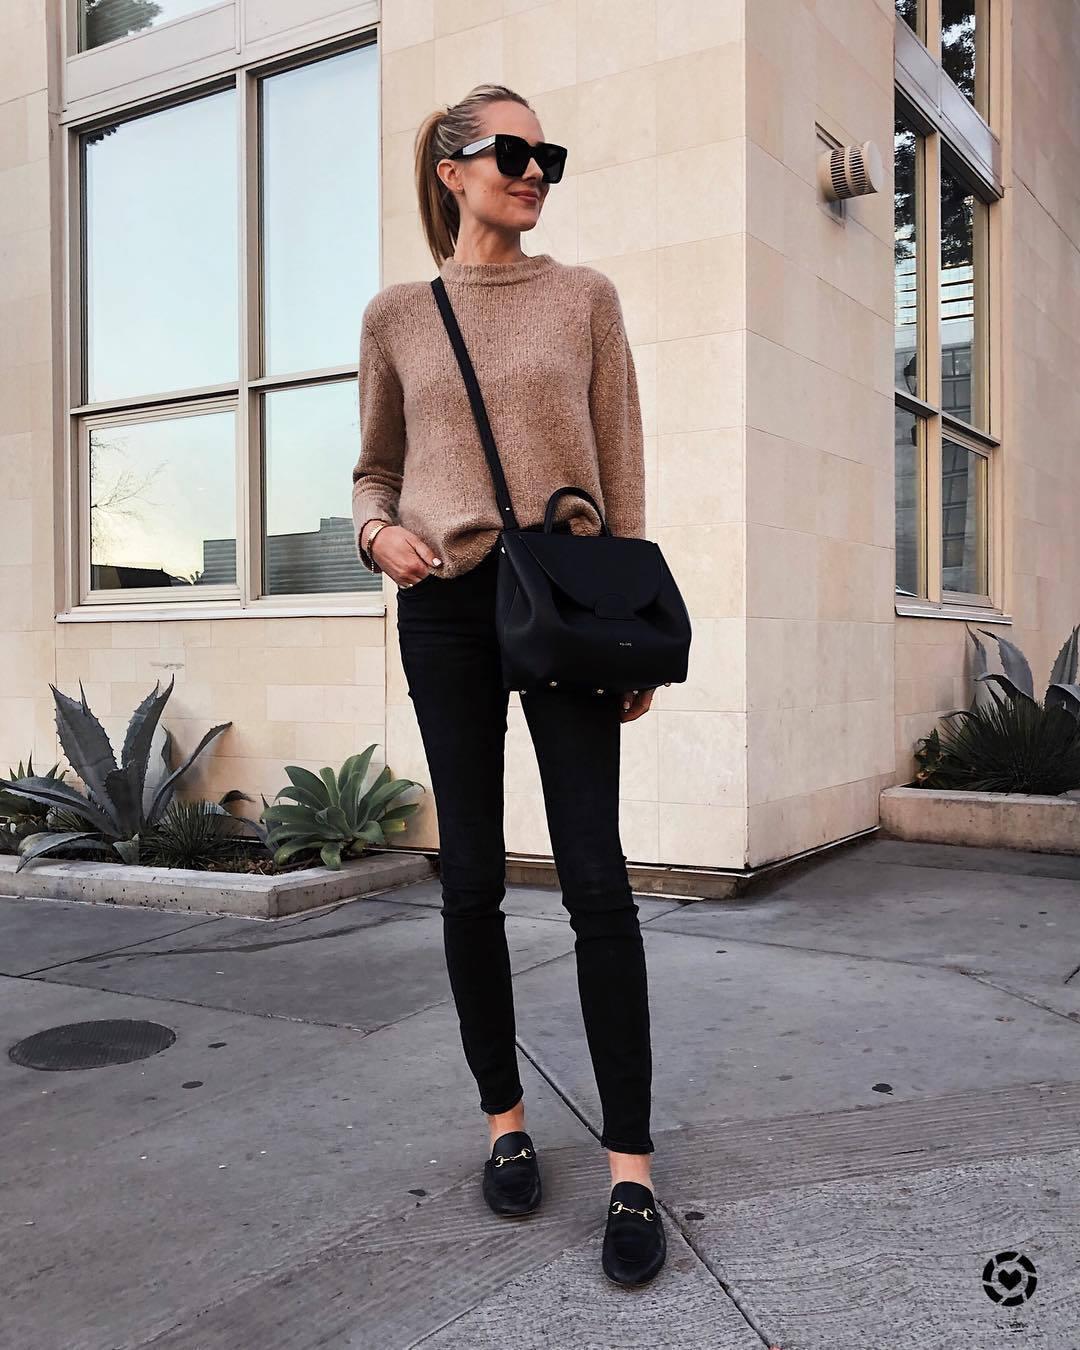 sweater knitted sweater loafers black skinny jeans black bag crossbody bag black sunglasses